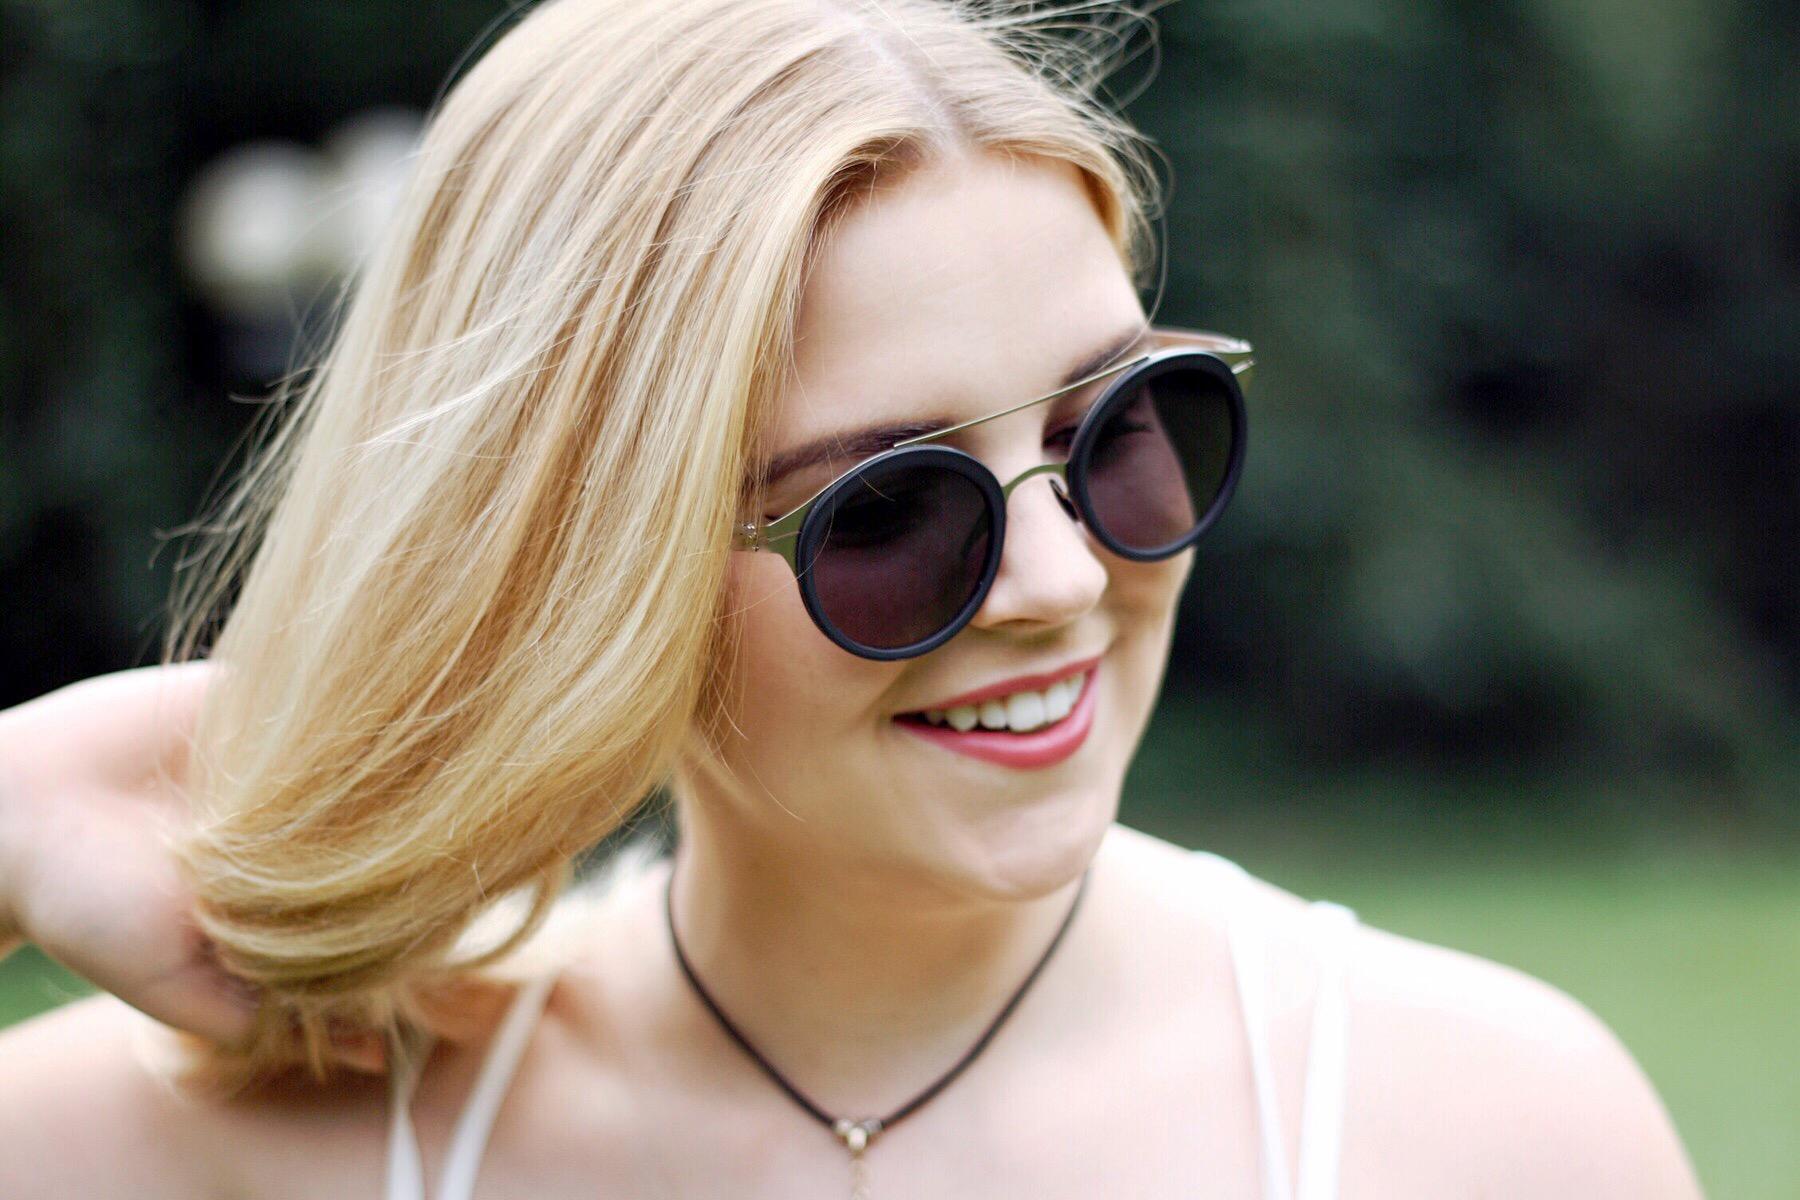 fashionblogger_hannover_fashionblog_modeblog_sonnenbrille_becker_flöge_trend_2016_ic_berlin_eyewear_trend_style_sunglasses